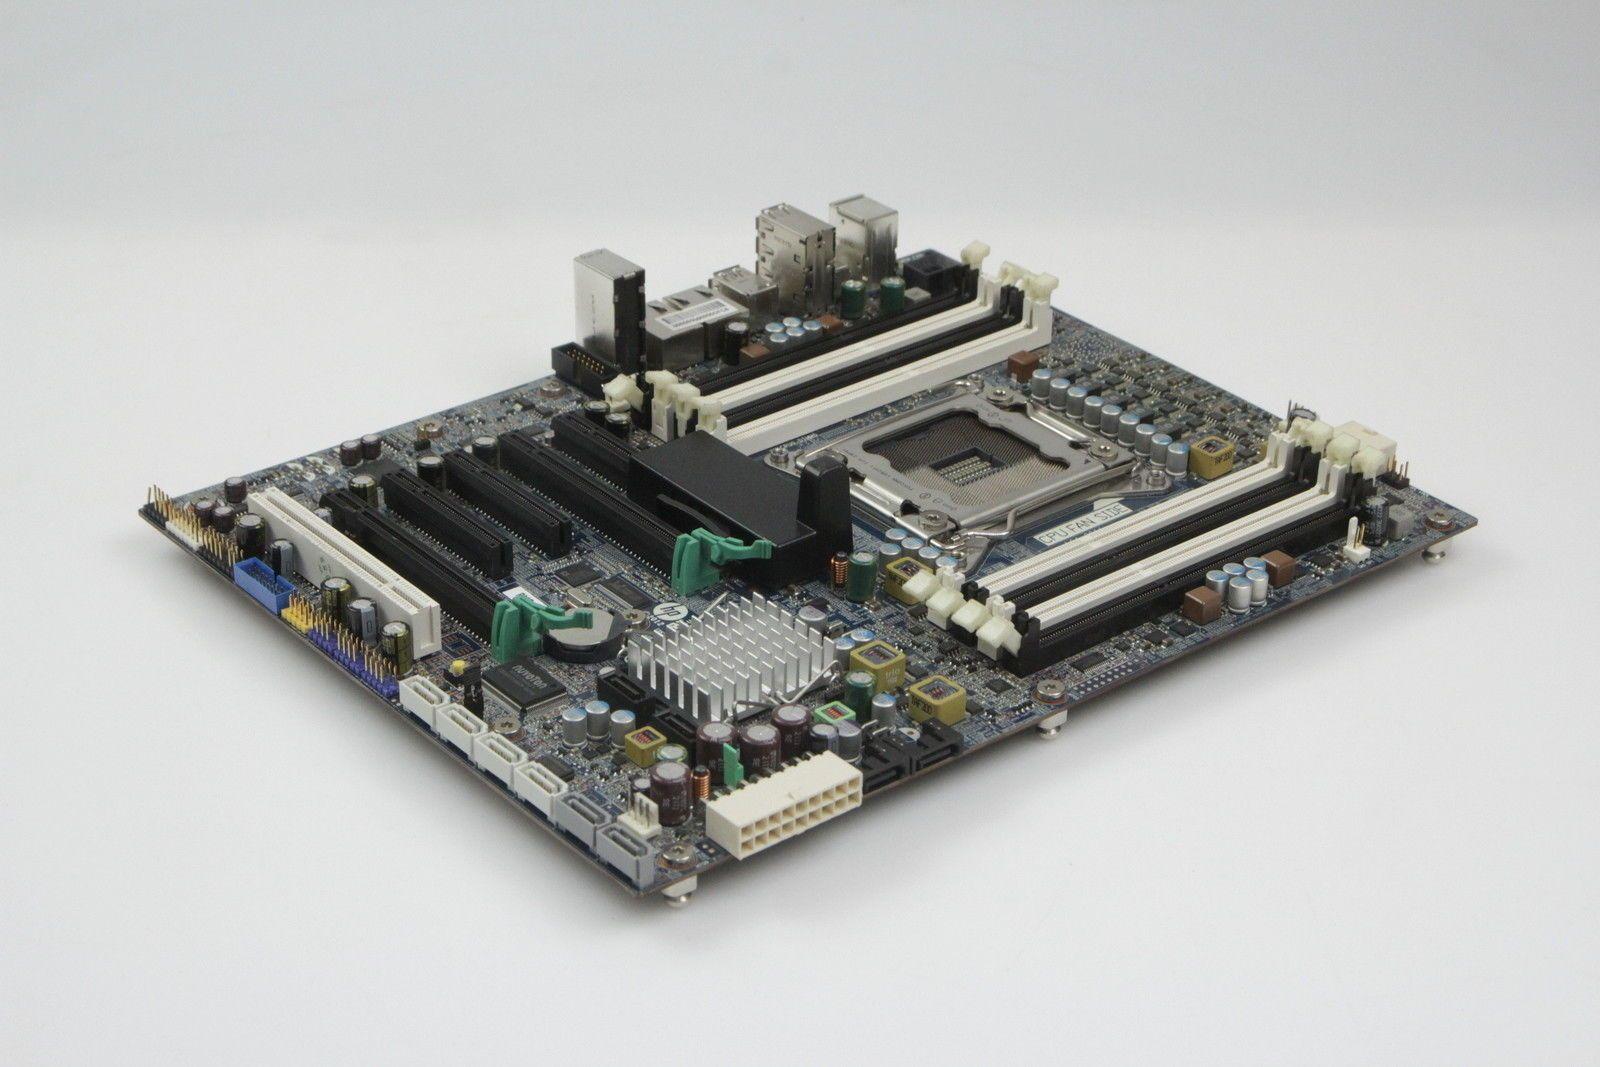 Original For HP Z620 Desktop Motherboard 619559-001 618264-001 Chipset X79  LGA 2011 C602 Full Tested Free Shipping